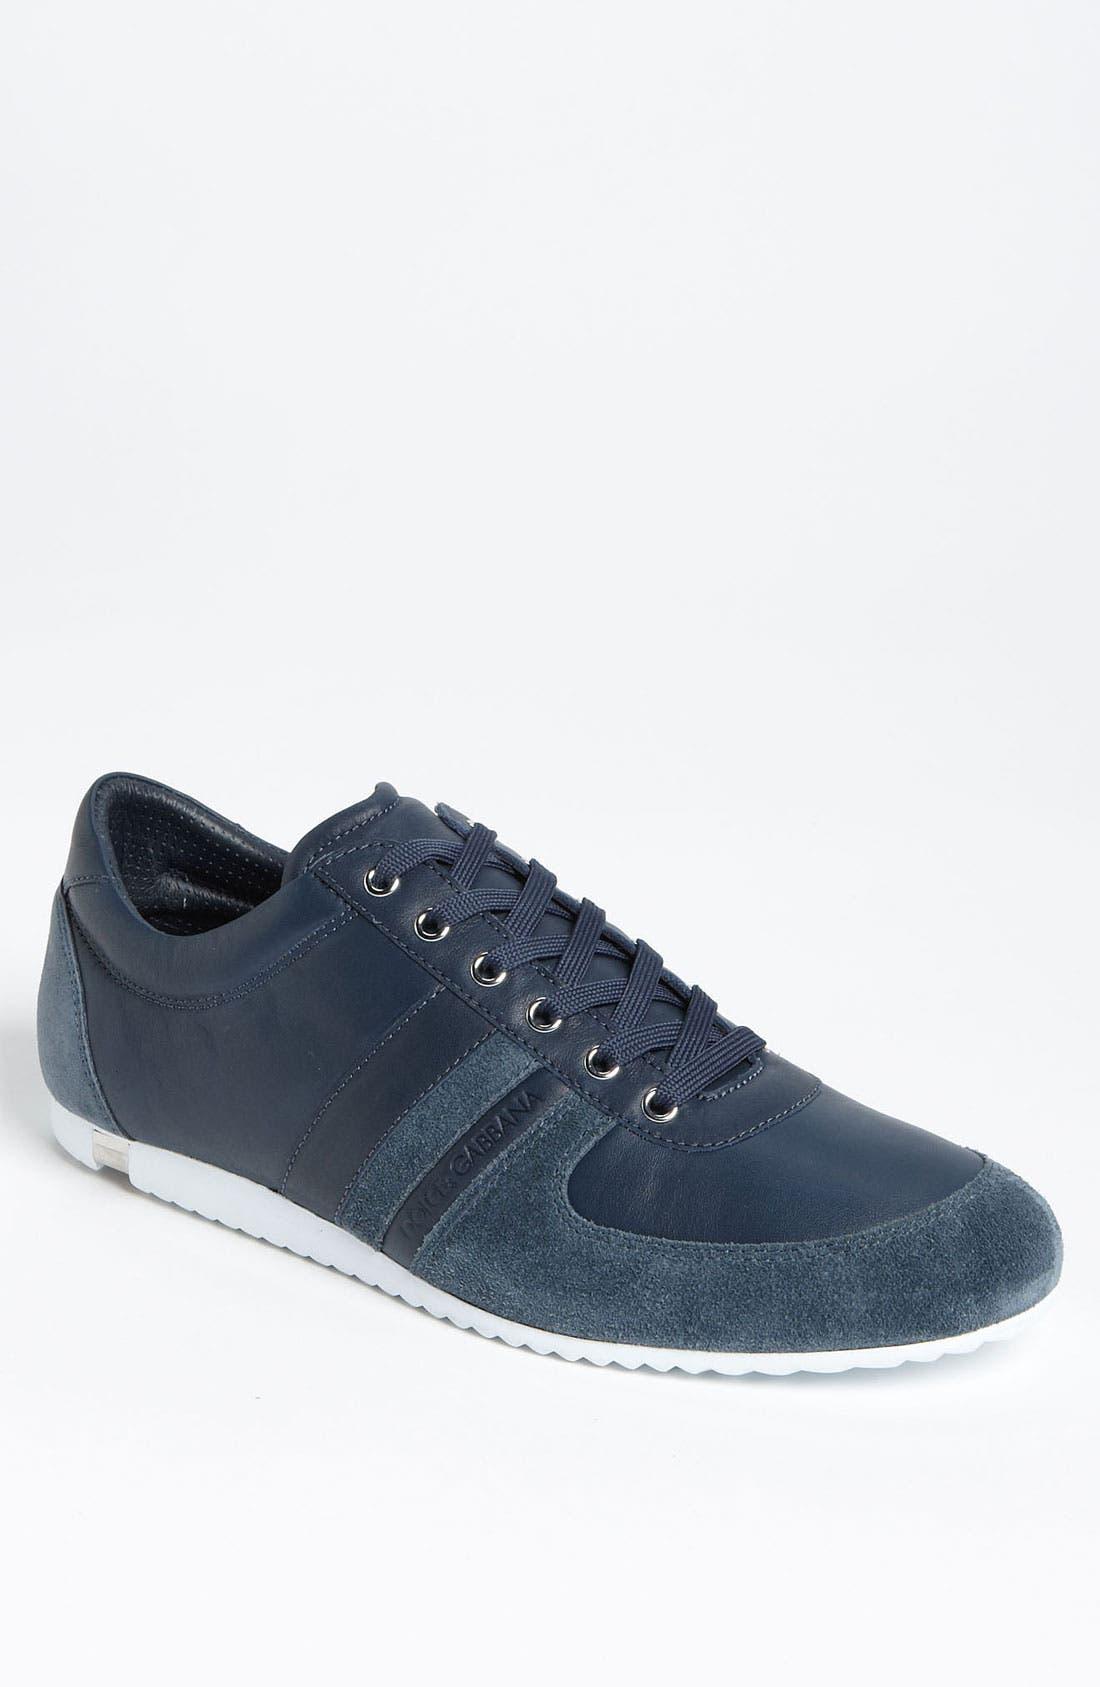 Main Image - Dolce&Gabbana 'Lo Pro' Sneaker